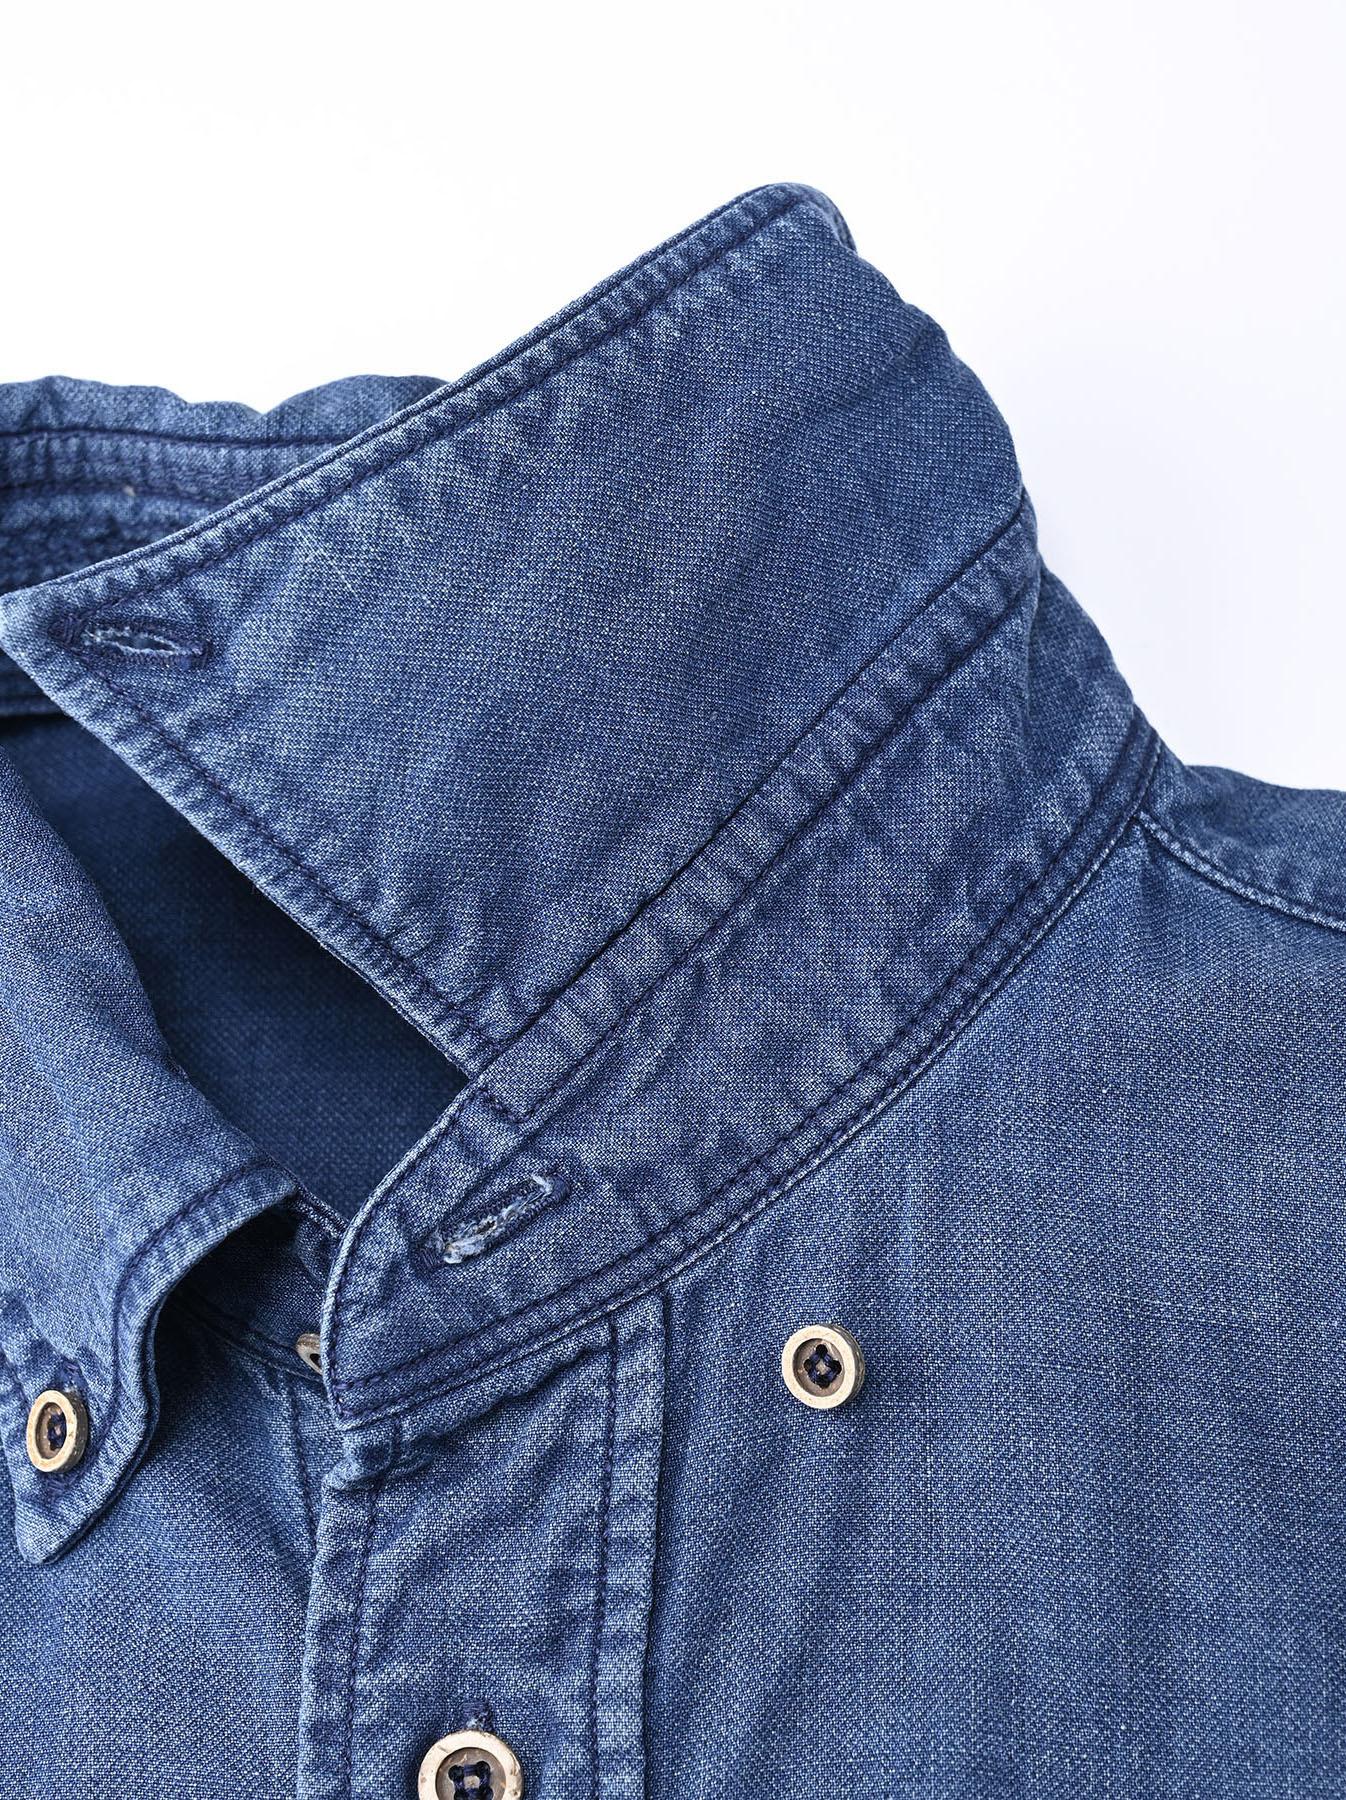 Indigo Gauze 908 Ocean Shirt Distressed-7